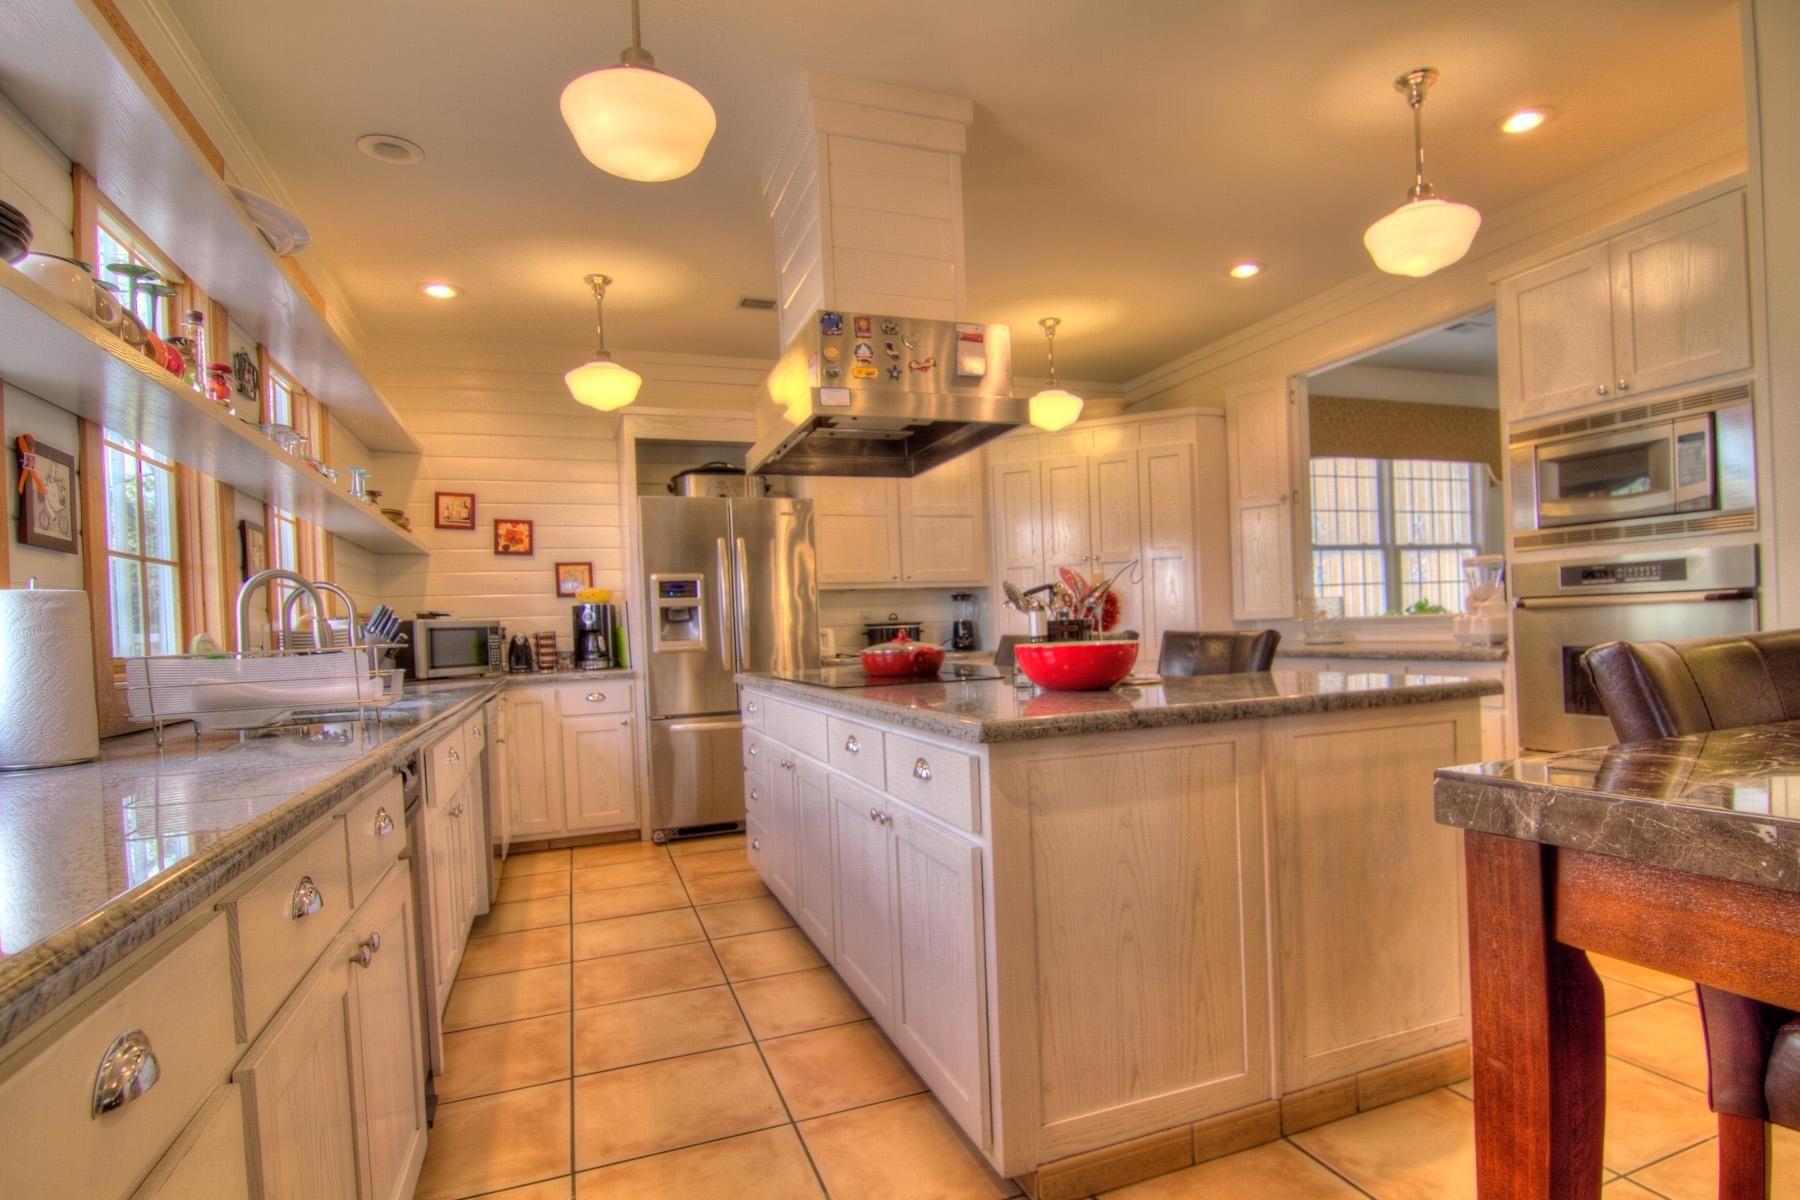 Lee Taylor Real Estate Albuquerque Mls Home Search 1696 Rusty Road Albuquerque Nm 87114 Mls 831084 Idx Real Estate For Sale Ki Home Kitchen Home Decor